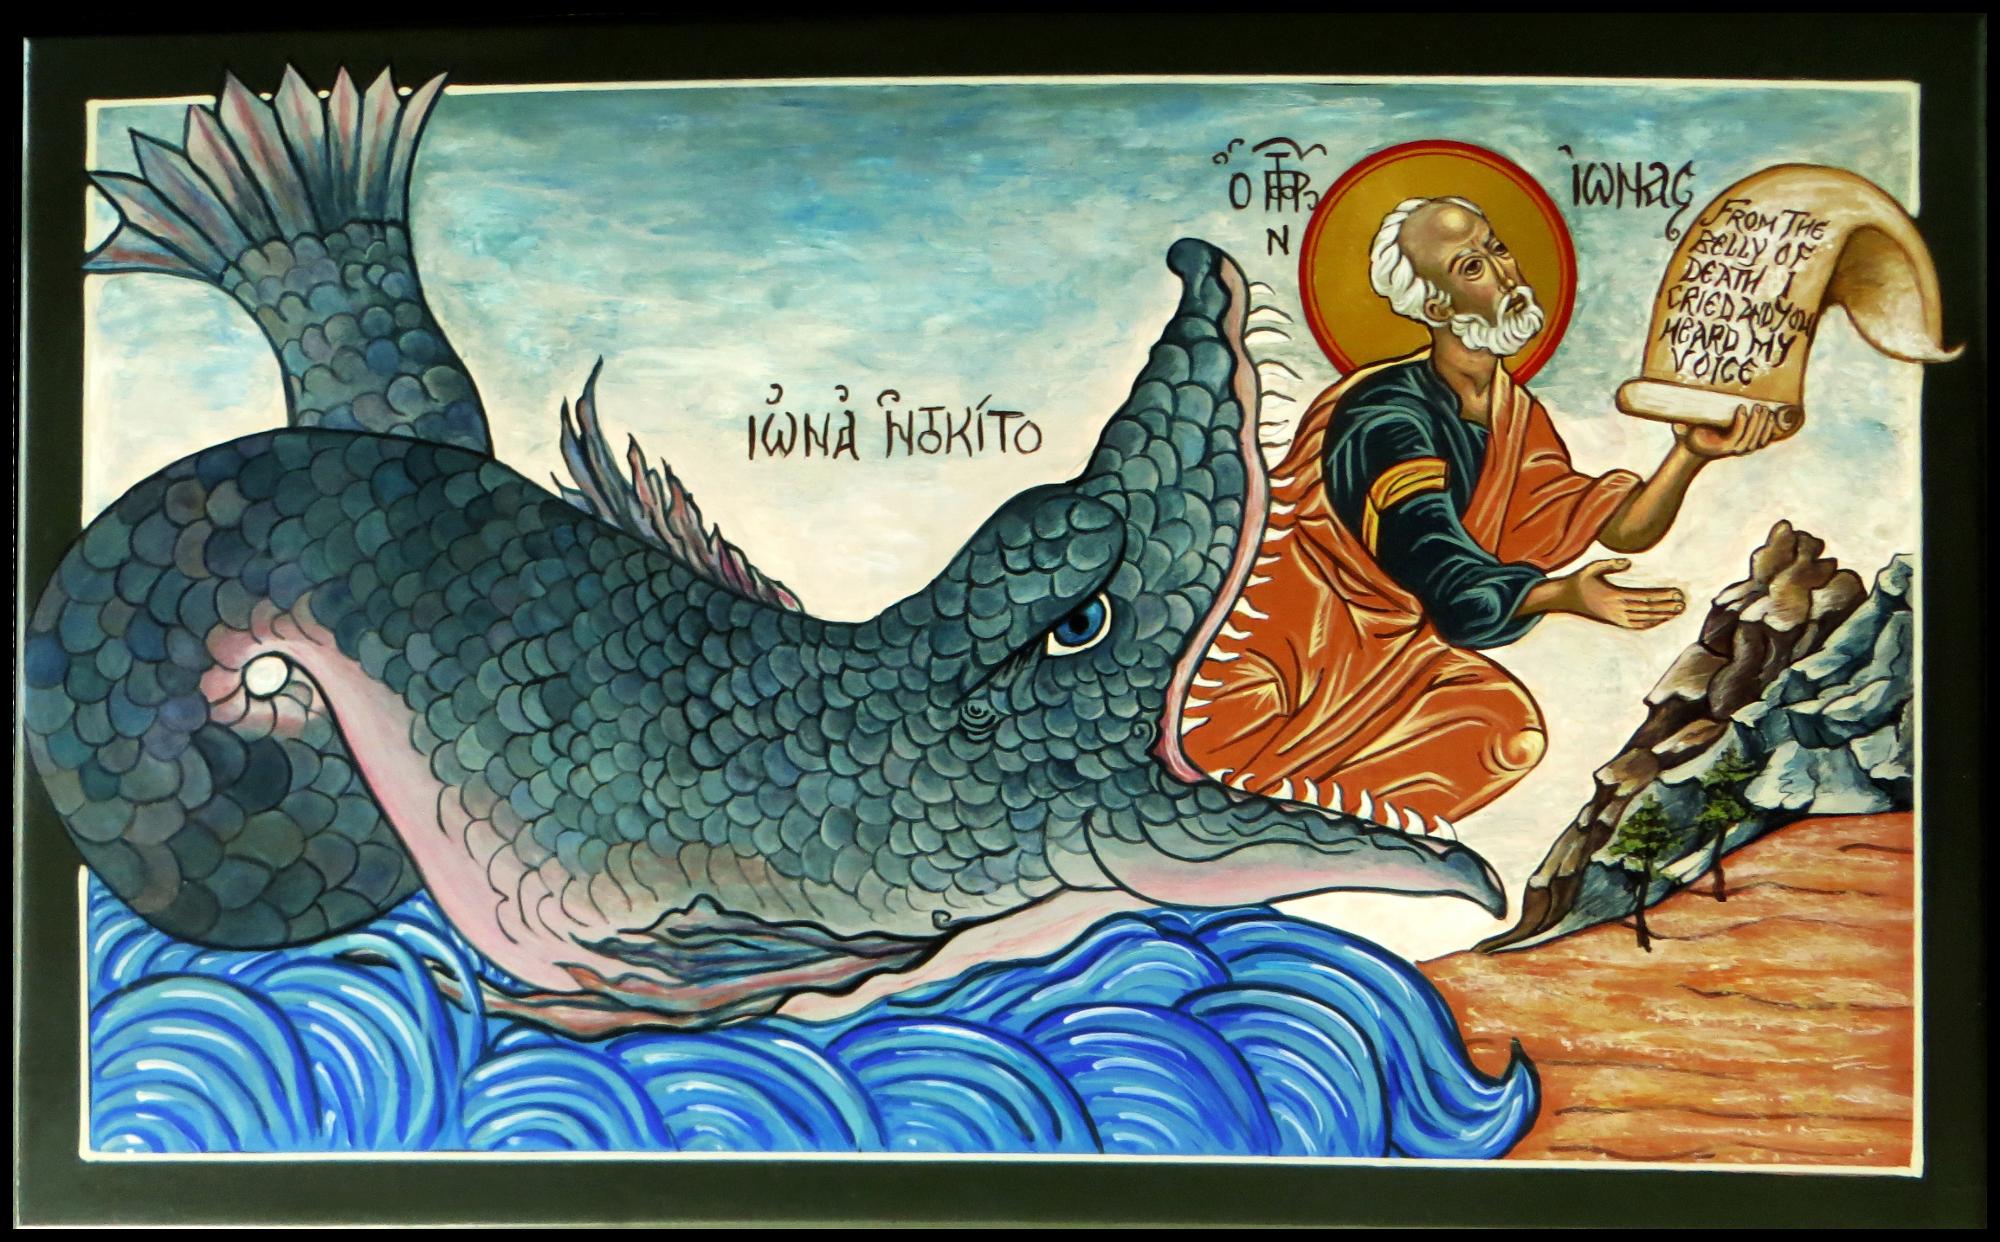 Картинки иона во чреве кита